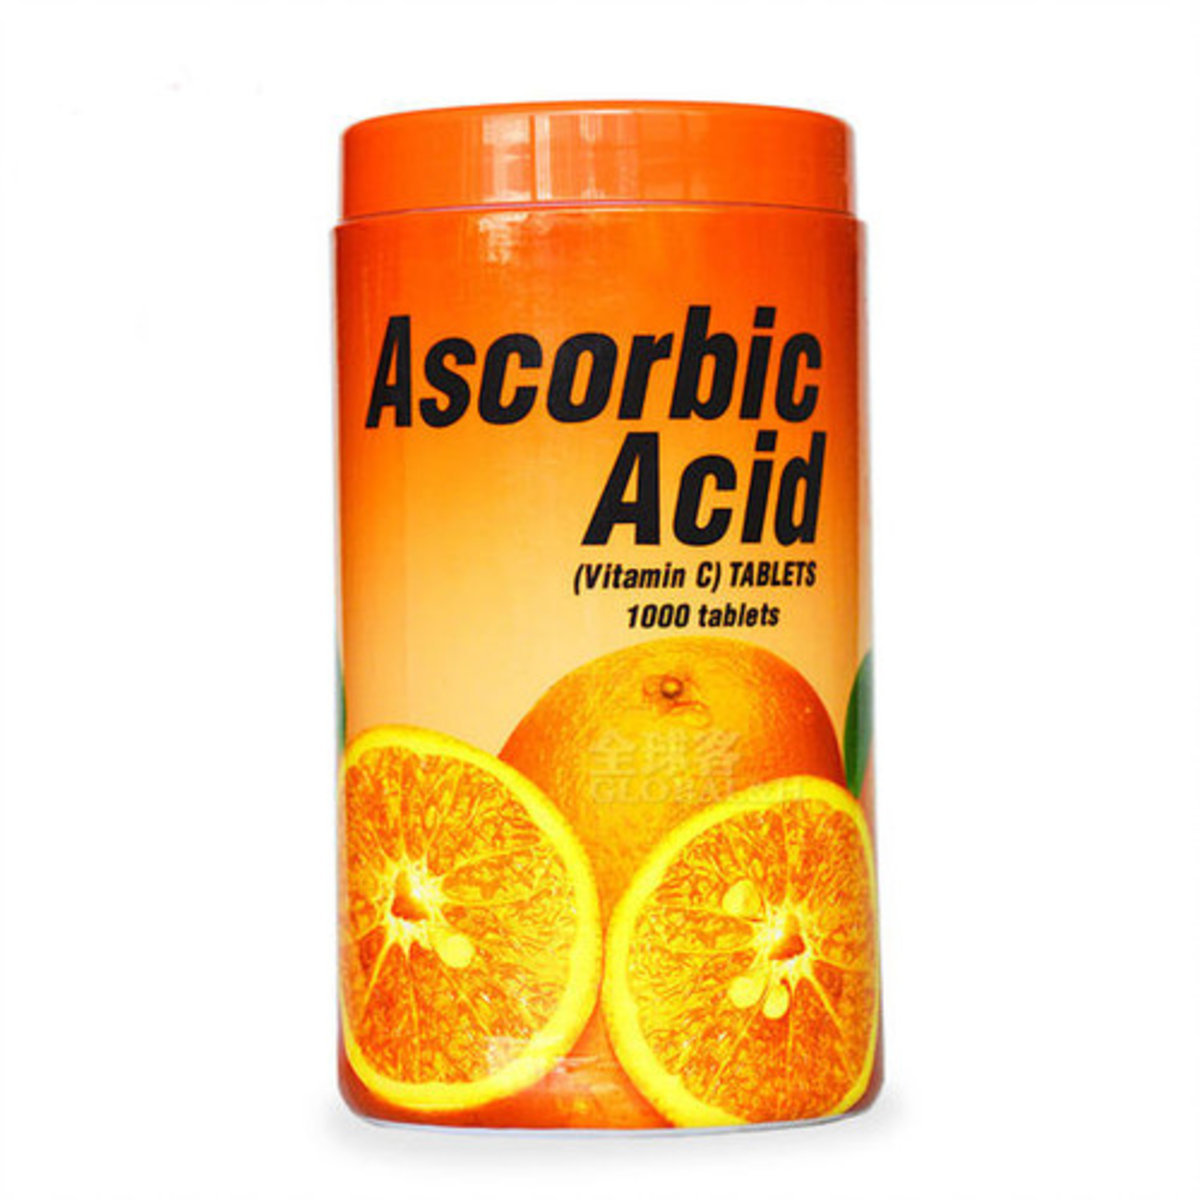 Ascorbic Acid Vitamin C 1000 Tablets